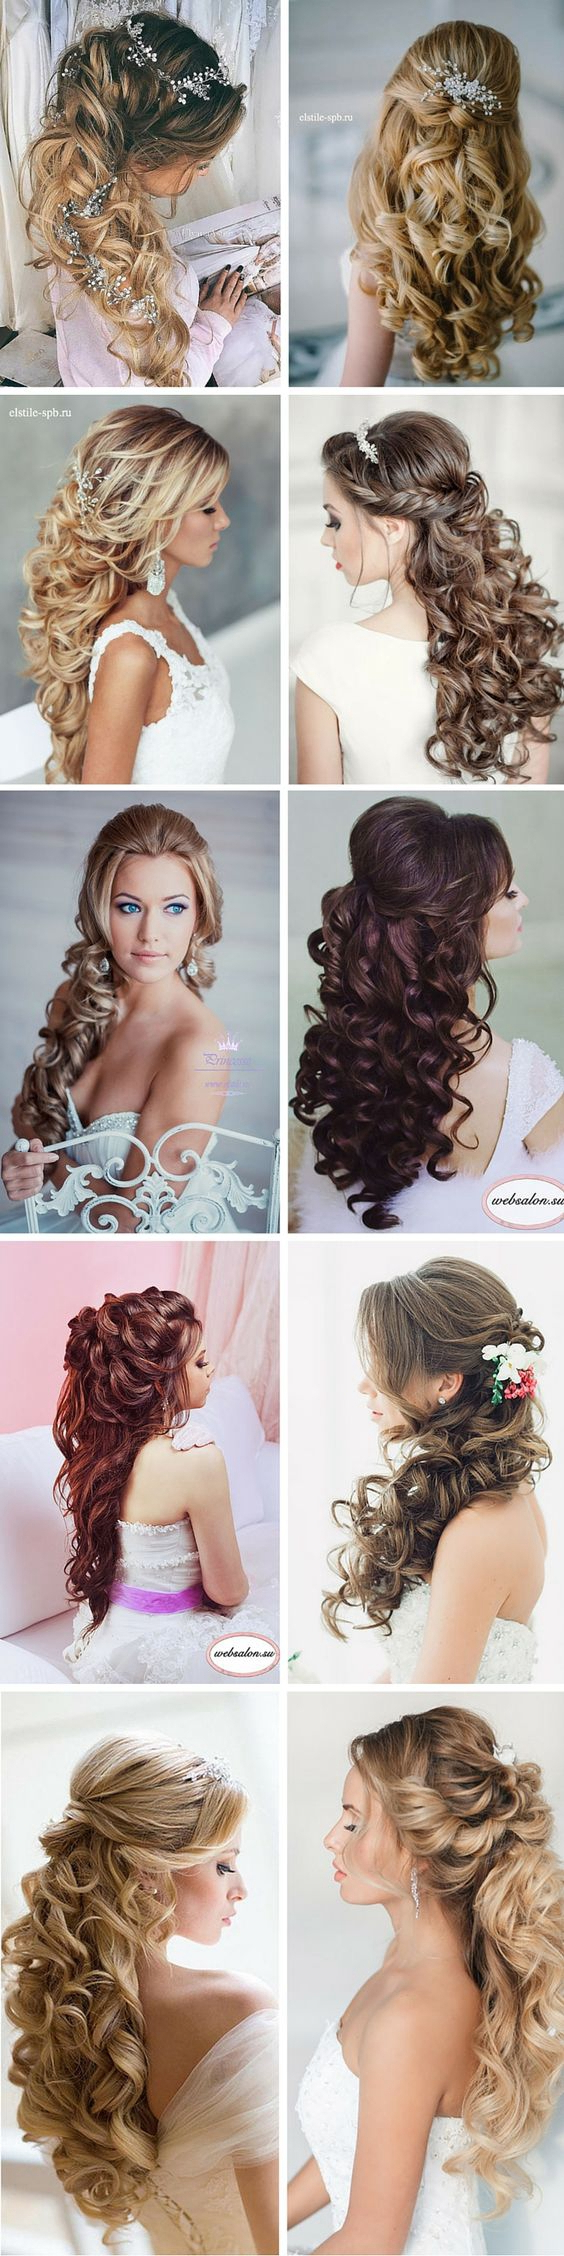 Recent Elegant Bridal Hairdos For Ombre Hair Regarding 100+ Romantic Long Wedding Hairstyles 2019 – Curls, Half Up, Updos (View 8 of 20)